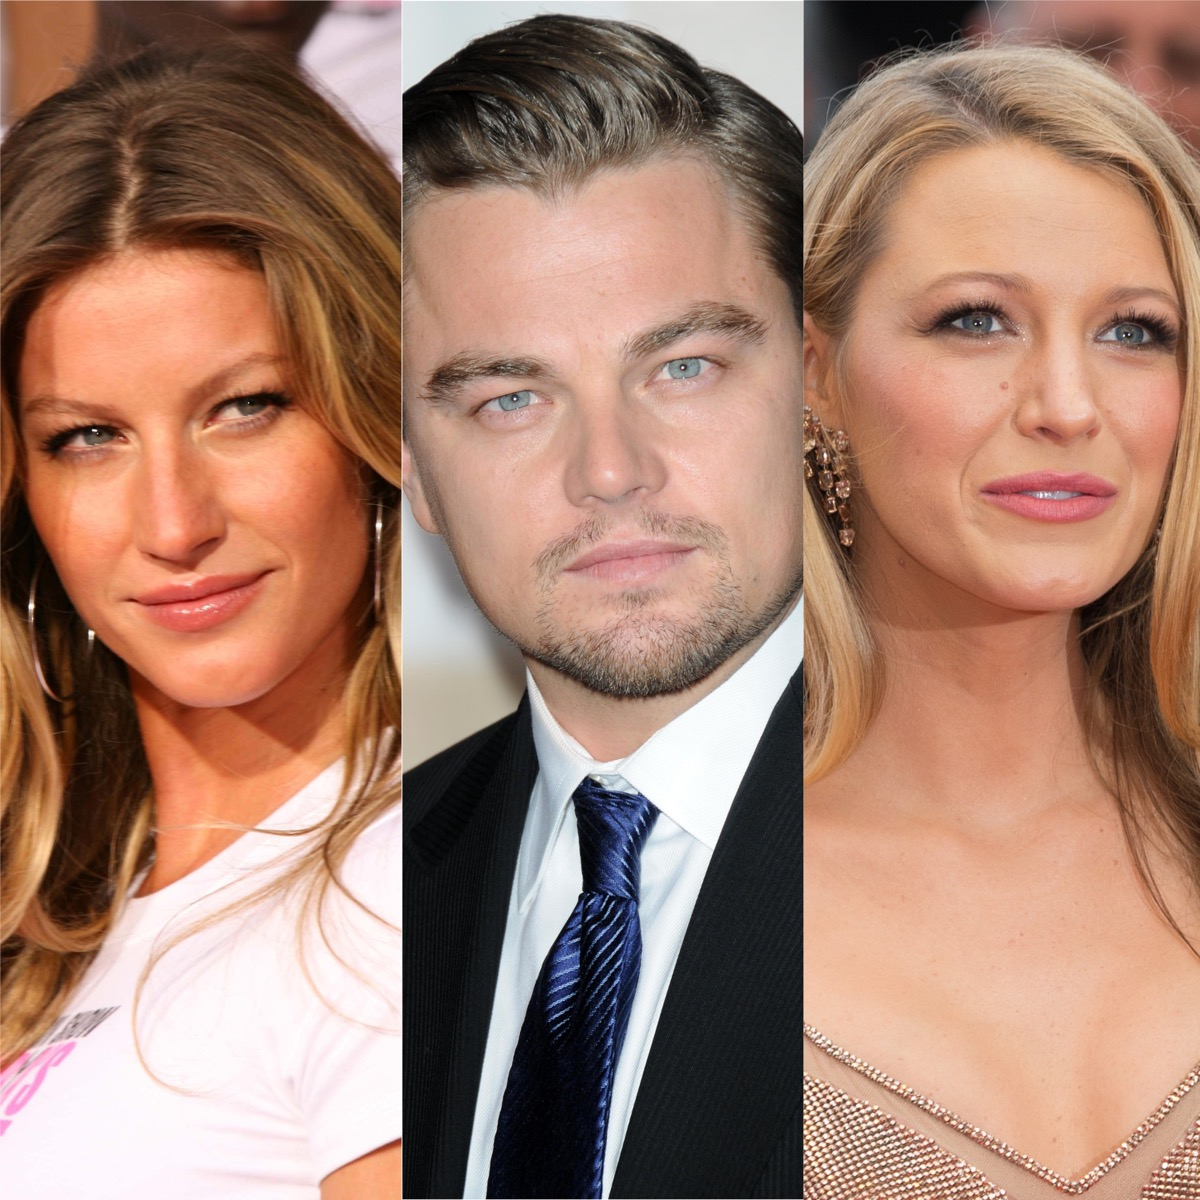 Gisele Bundchen, Leonardo DiCaprio, and Blake Lively